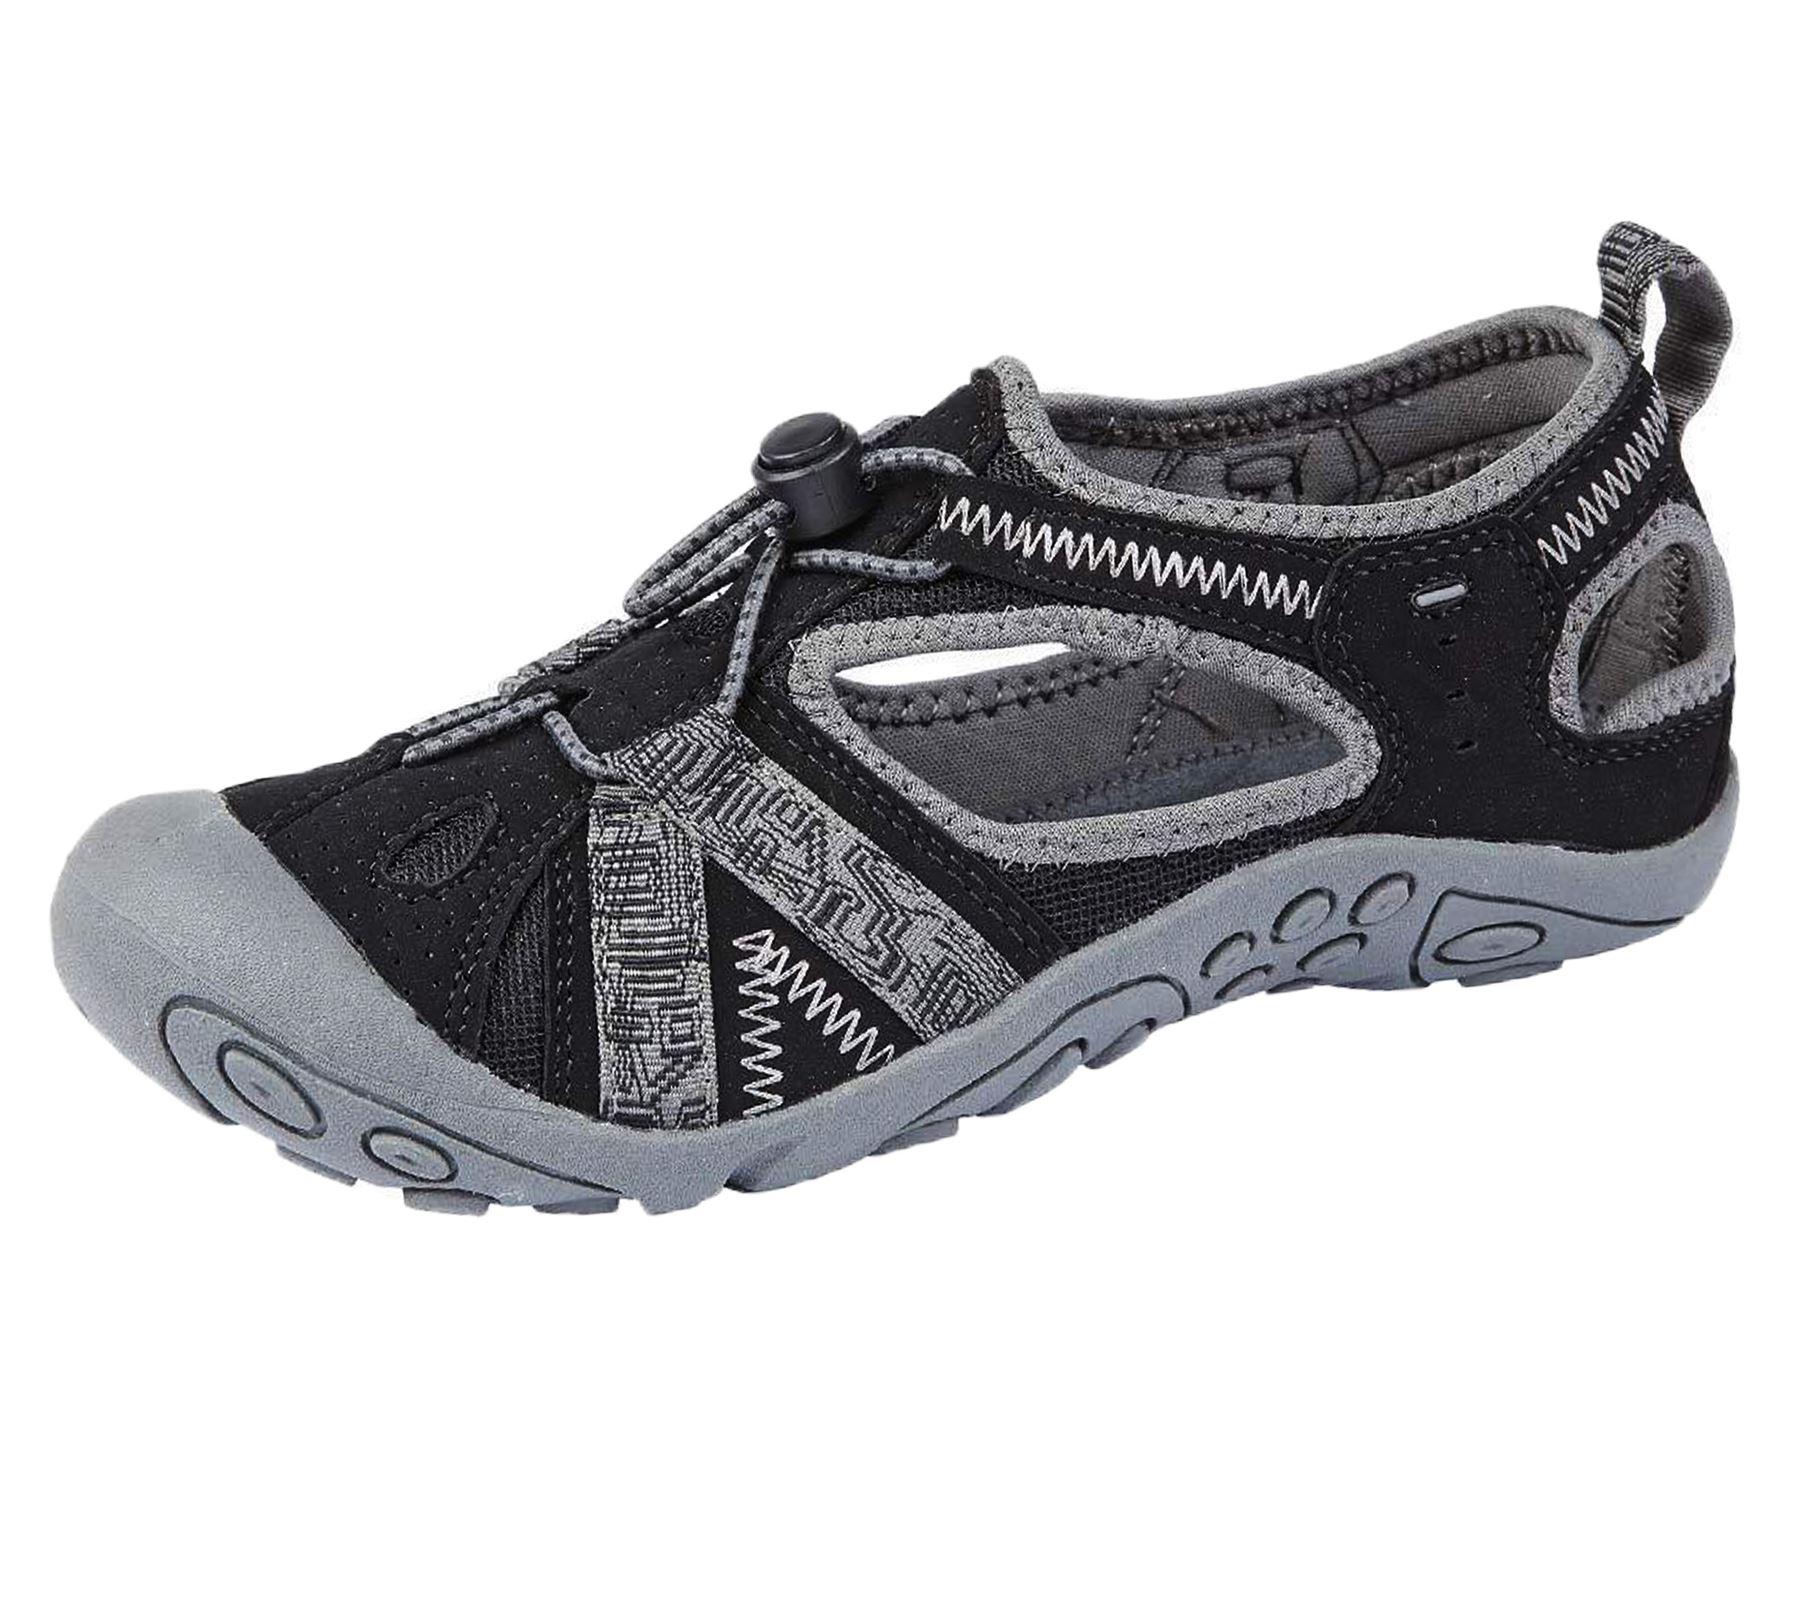 Womens Slip On Hiking Shoes